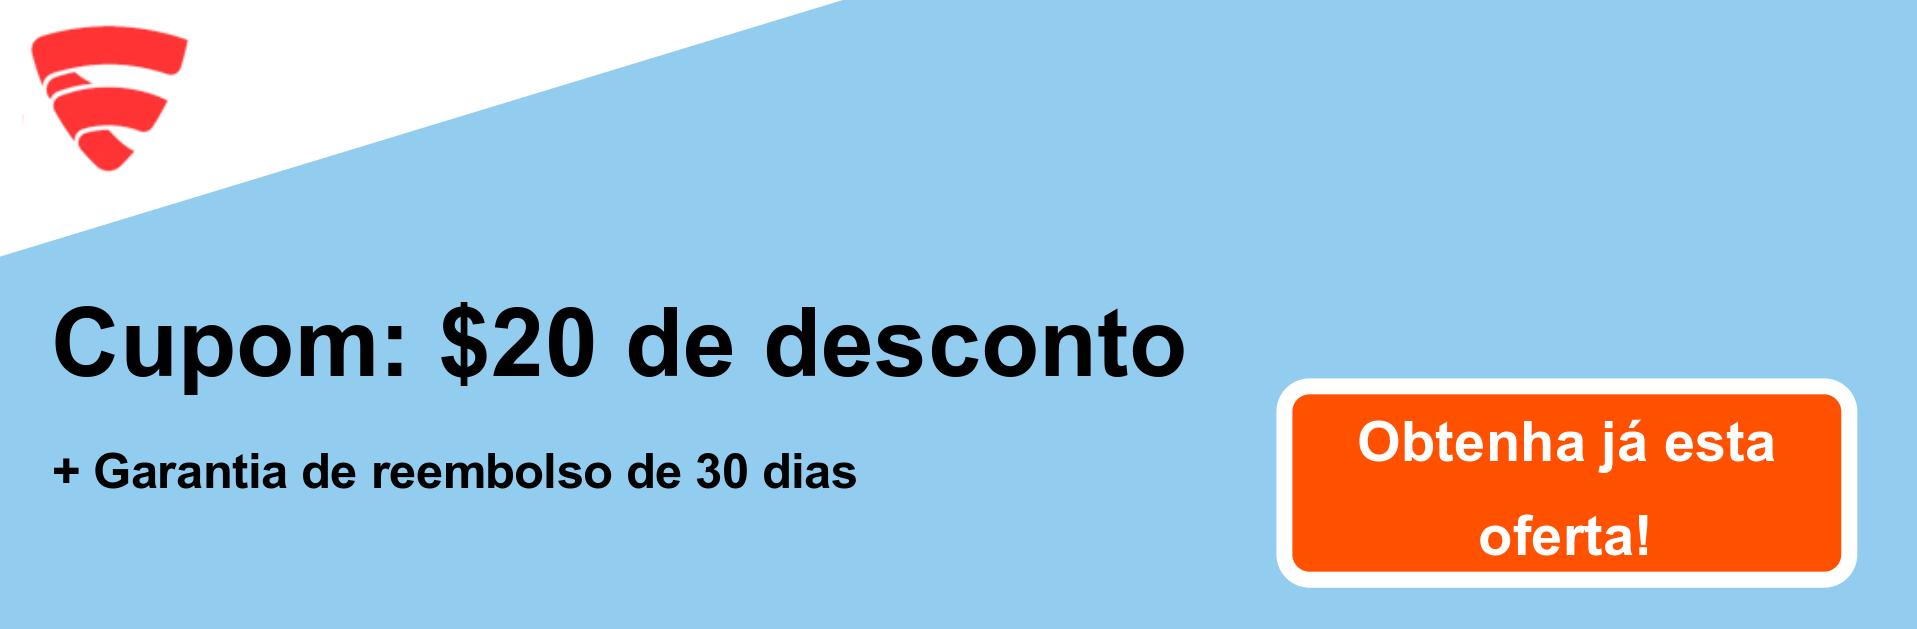 Cupom FSecureFreedome - US $ 20 de desconto